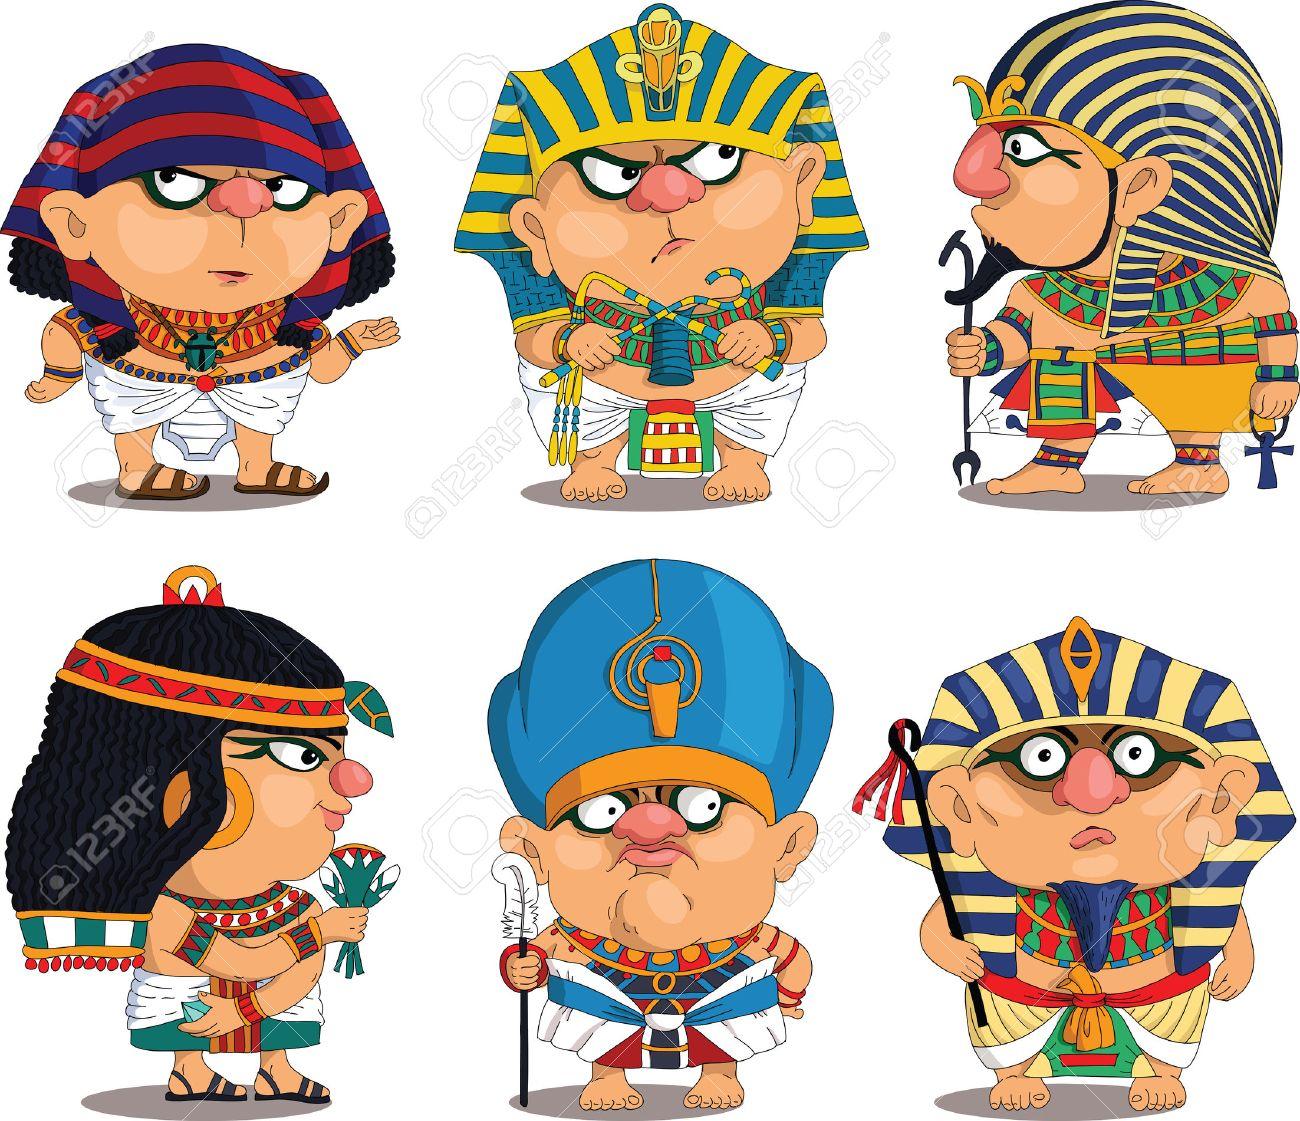 Karikatur. Vektor. Set Lustige ägyptischen Pharaonen. Travestie-Cartoon. Figuren. Isolierte Objekte. Standard-Bild - 51353449